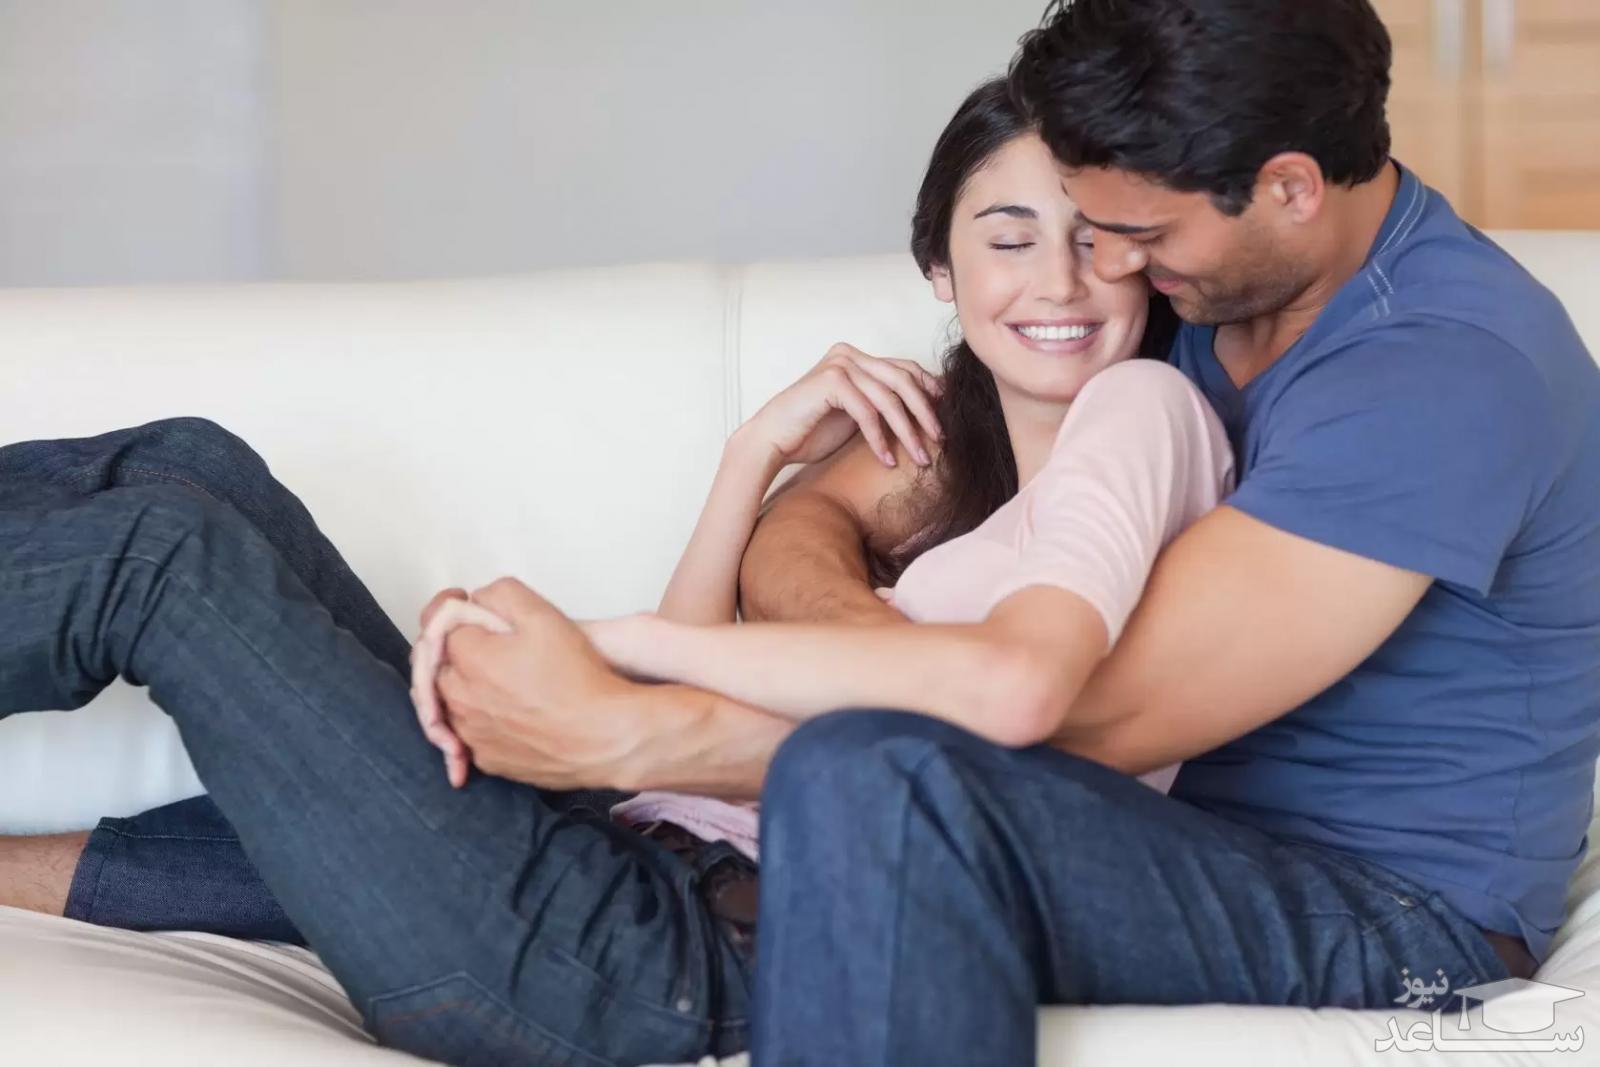 عواقب داشتن رابطه جنسی قبل از ازدواج